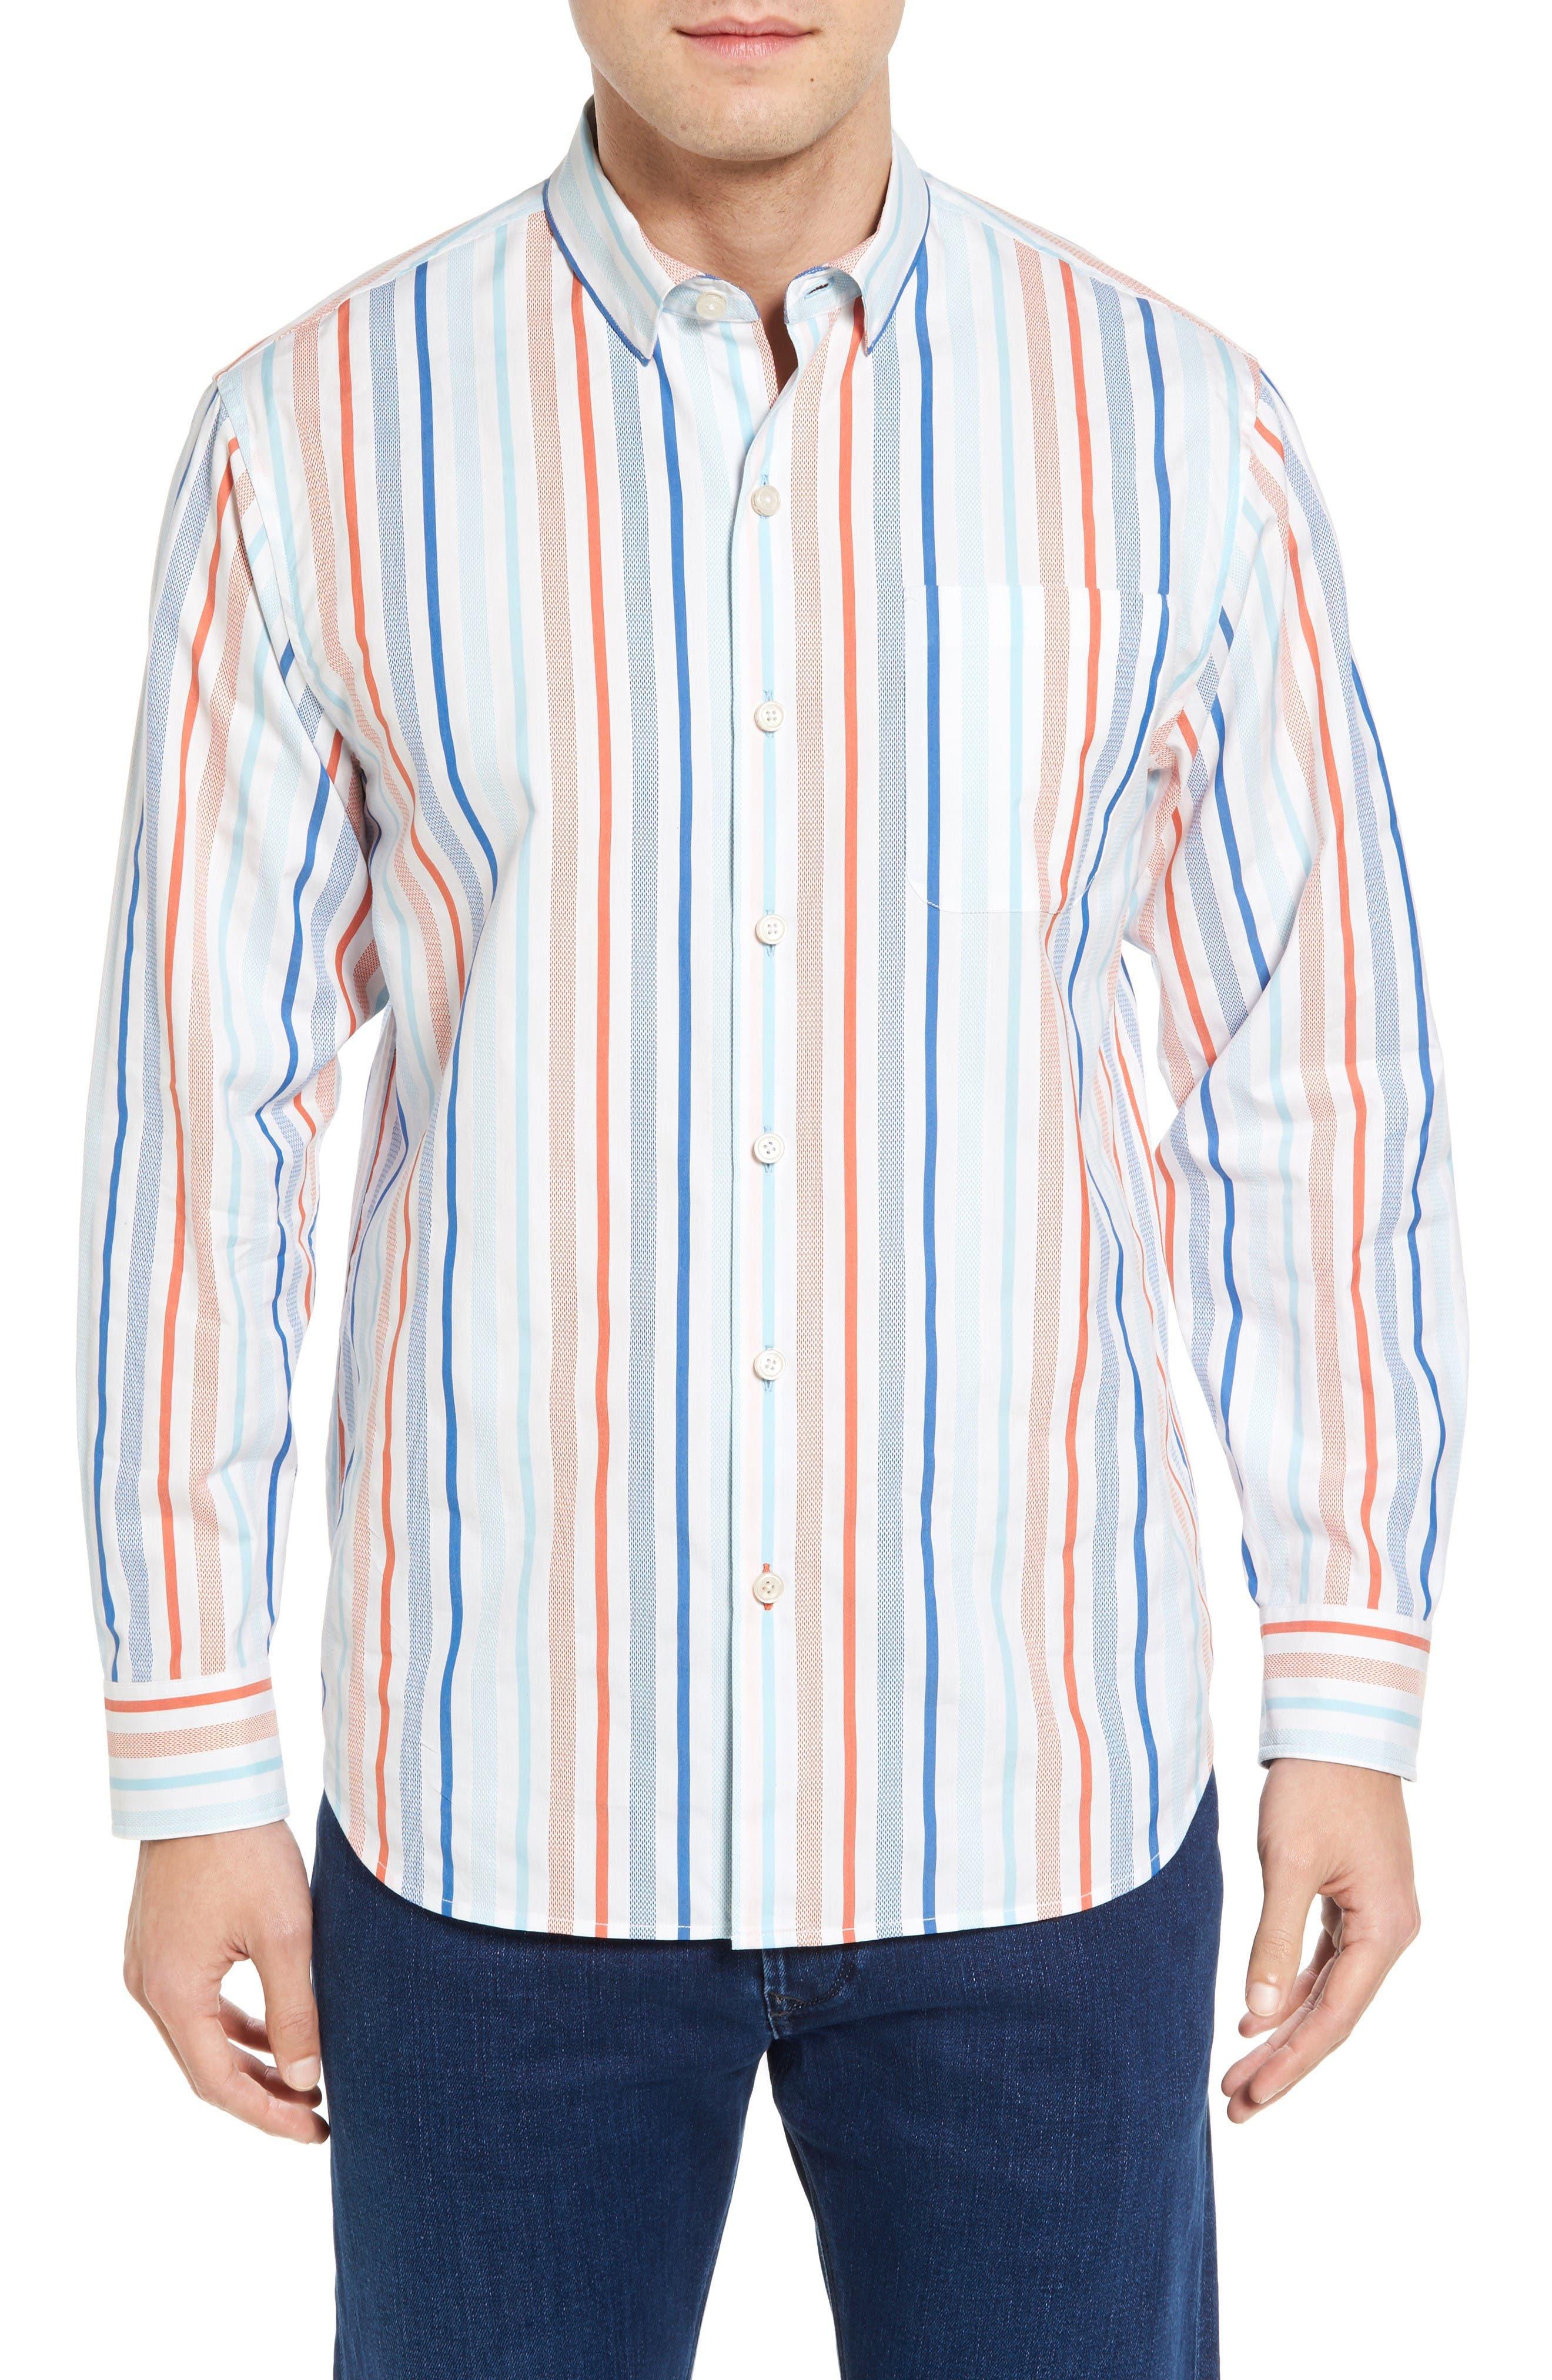 Alternate Image 1 Selected - Tommy Bahama Demeter Stripe Sport Shirt